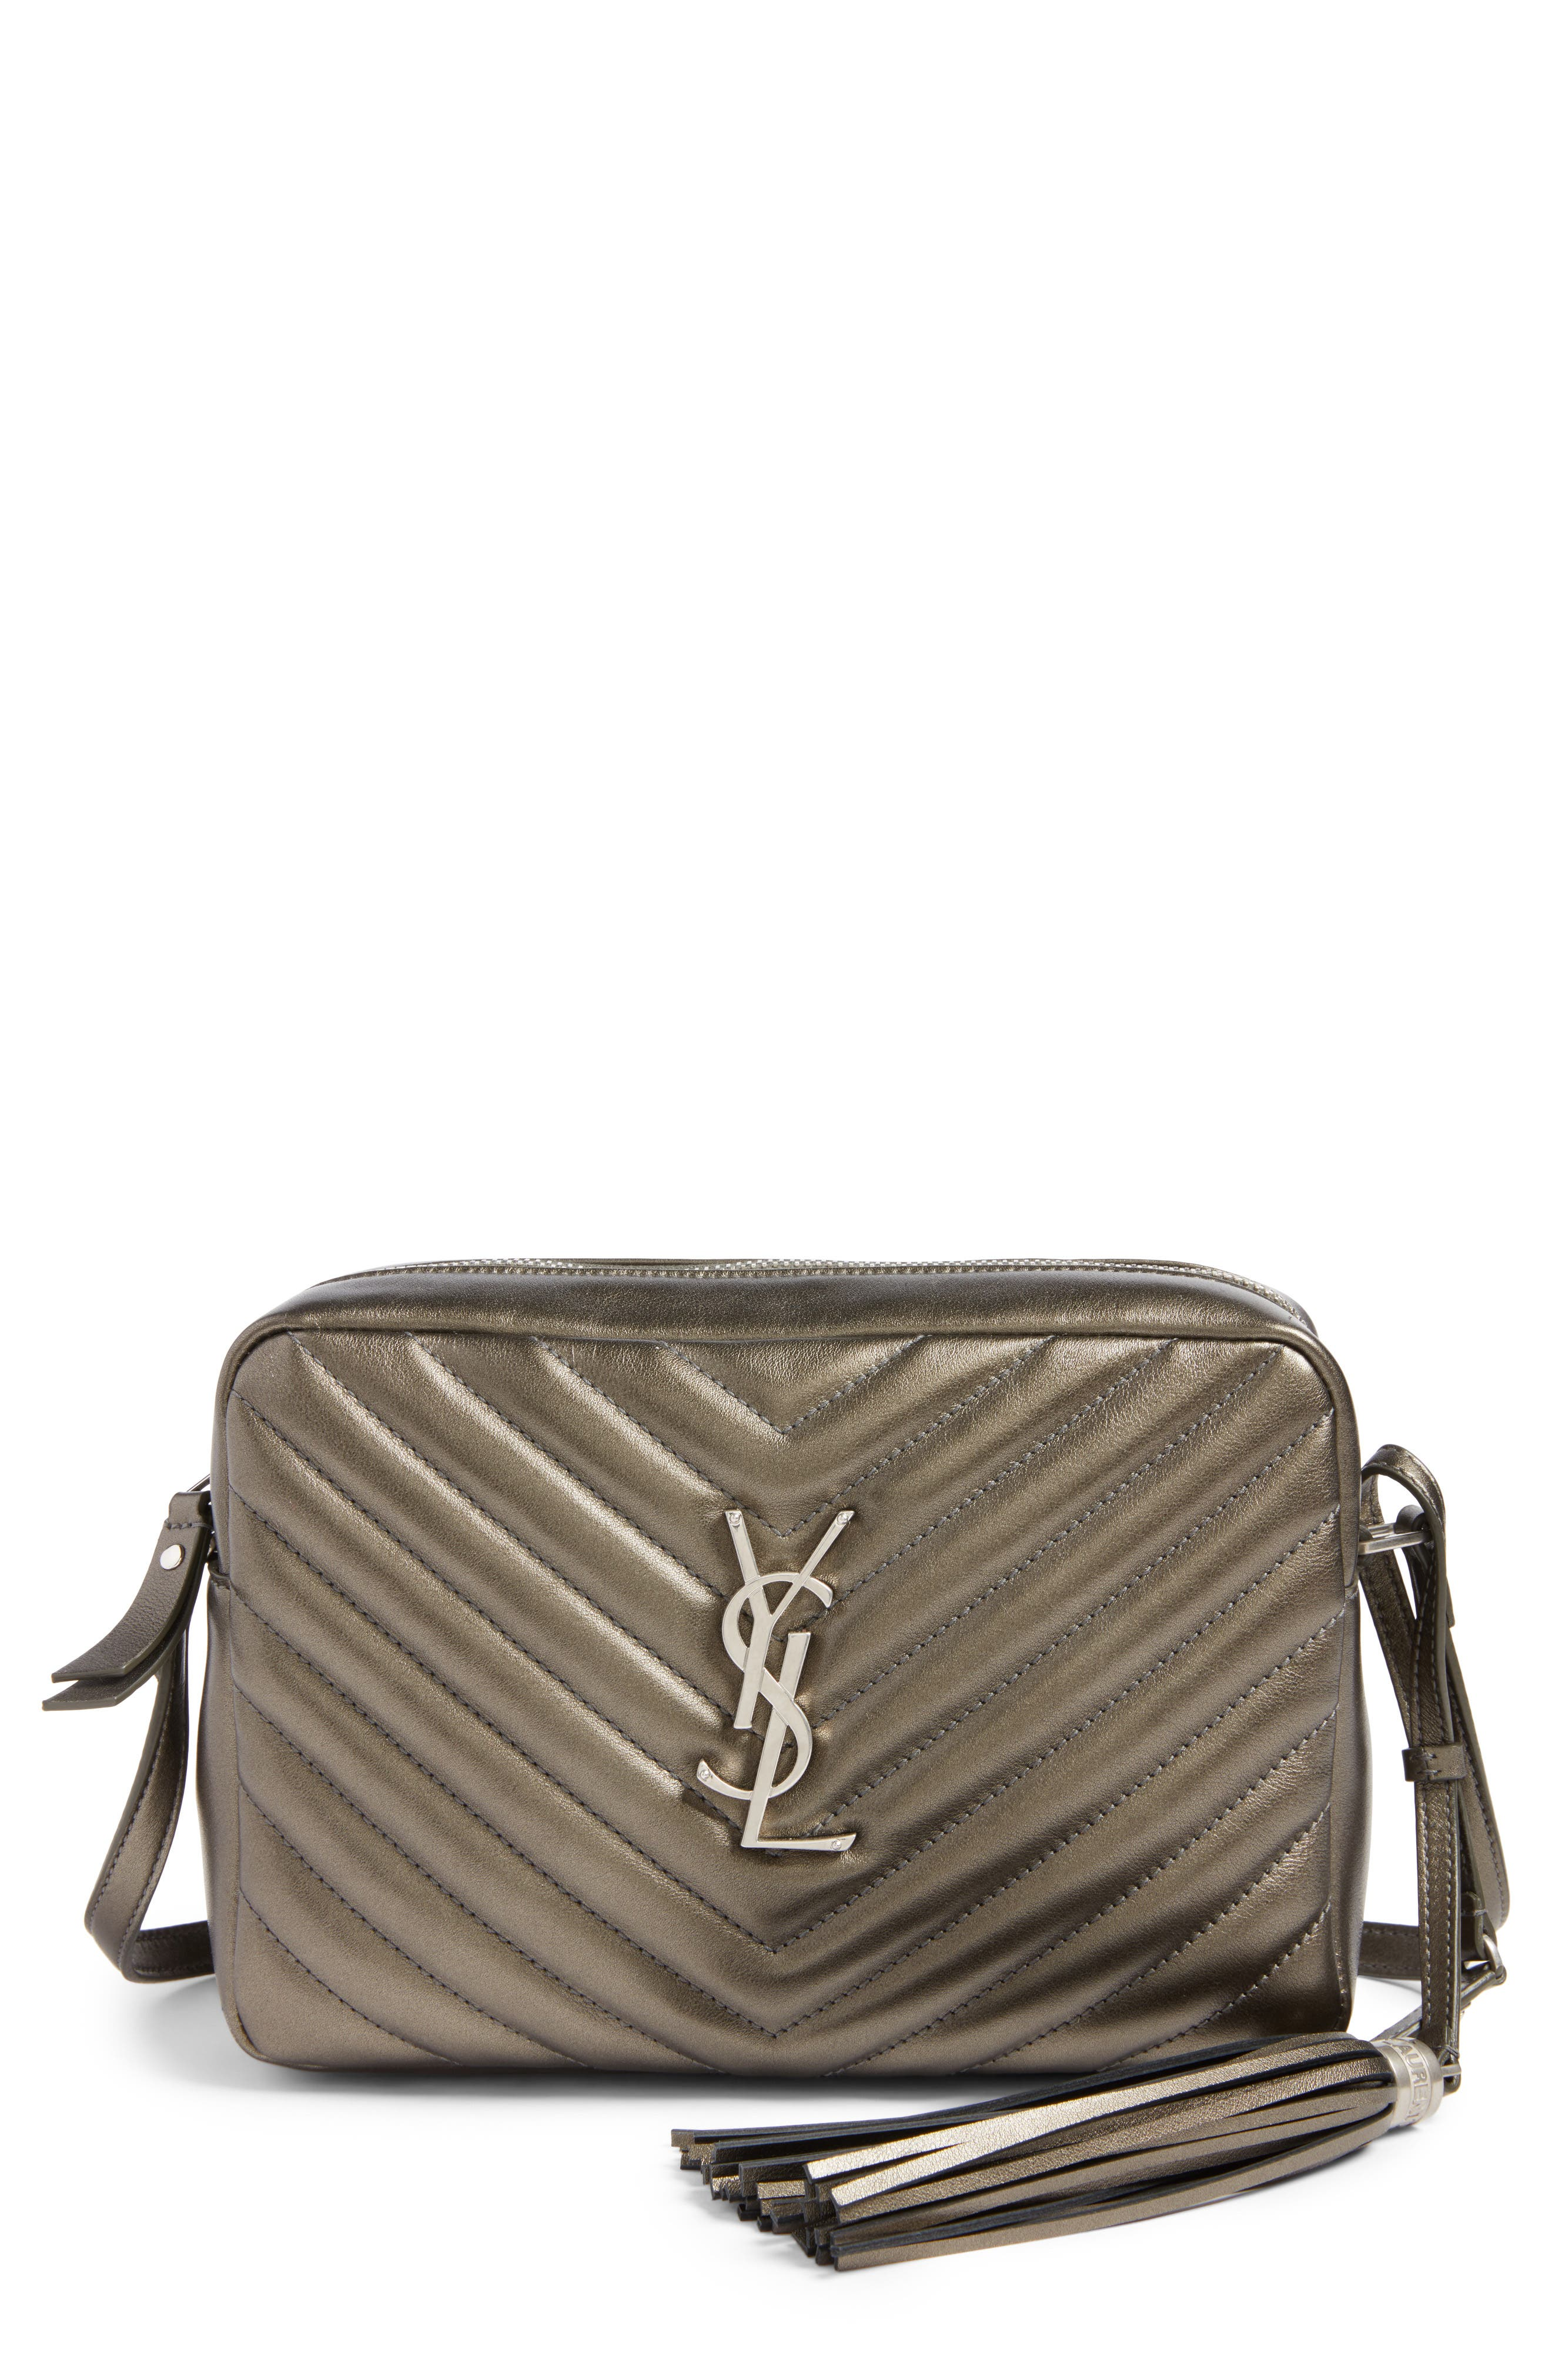 Medium Lou Calfskin Leather Camera Bag,                             Main thumbnail 1, color,                             020